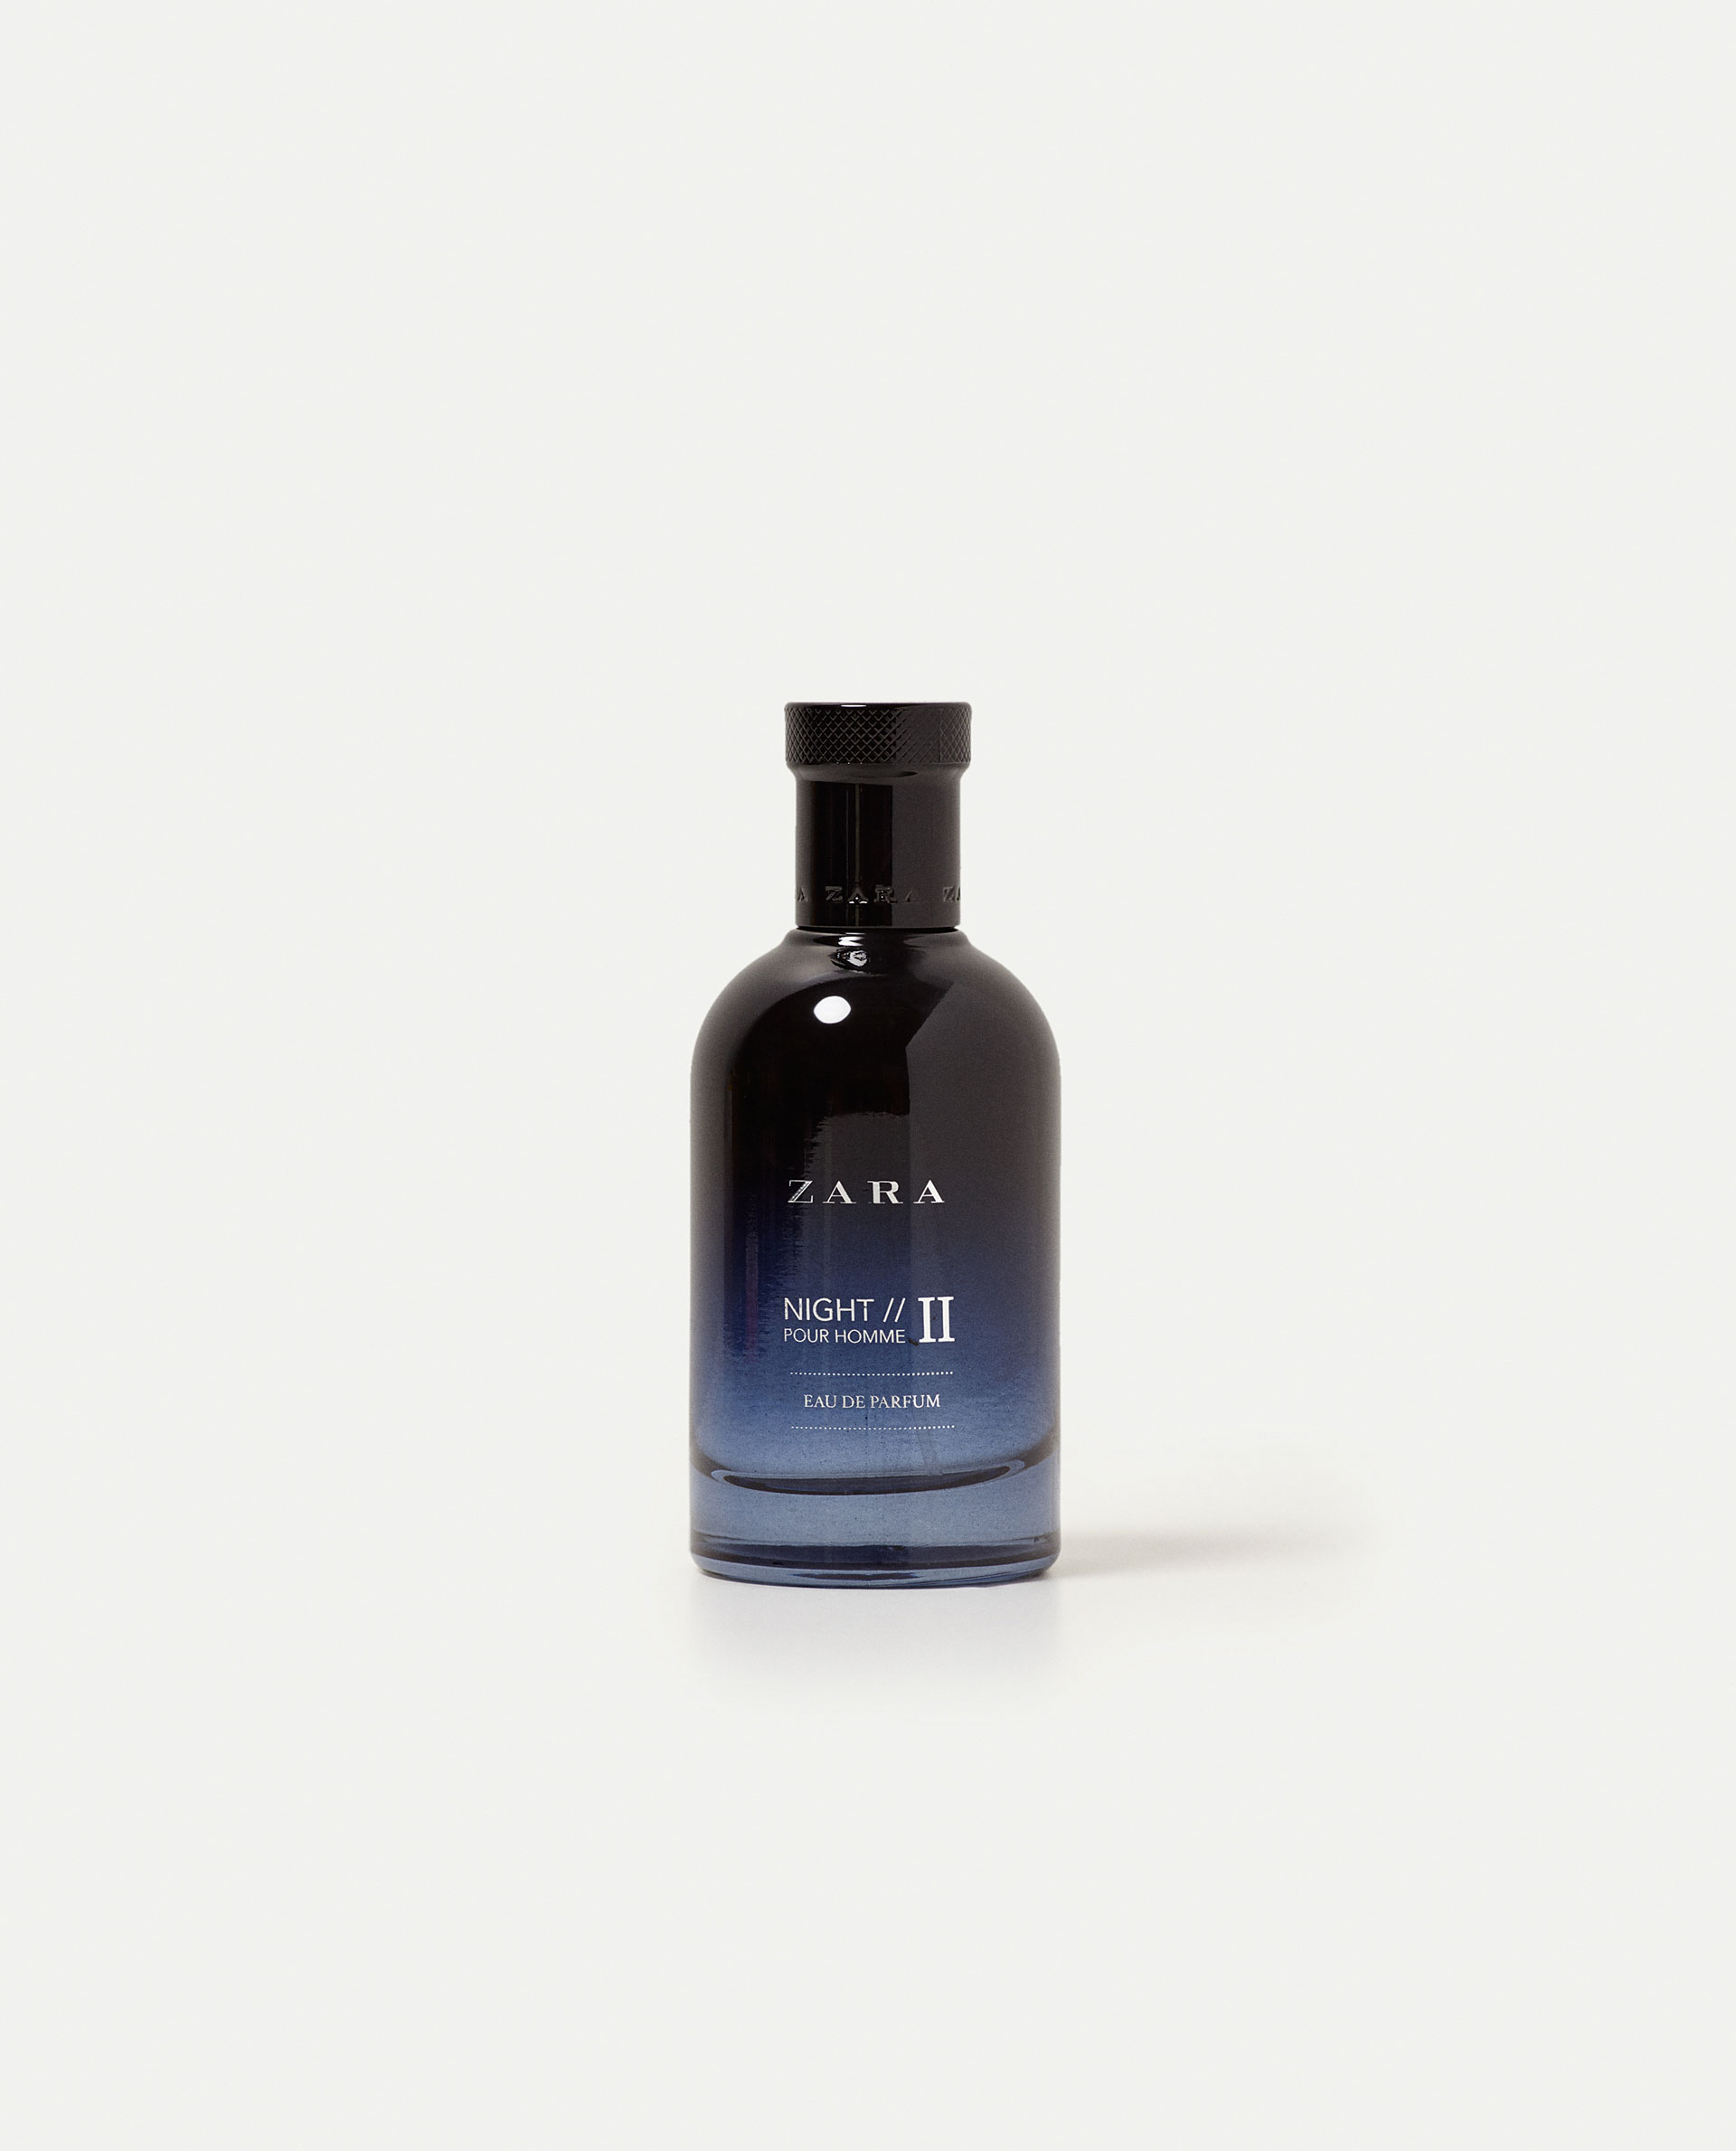 Zara Night Pour Homme Ii Zara Cologne A New Fragrance For Men 2017